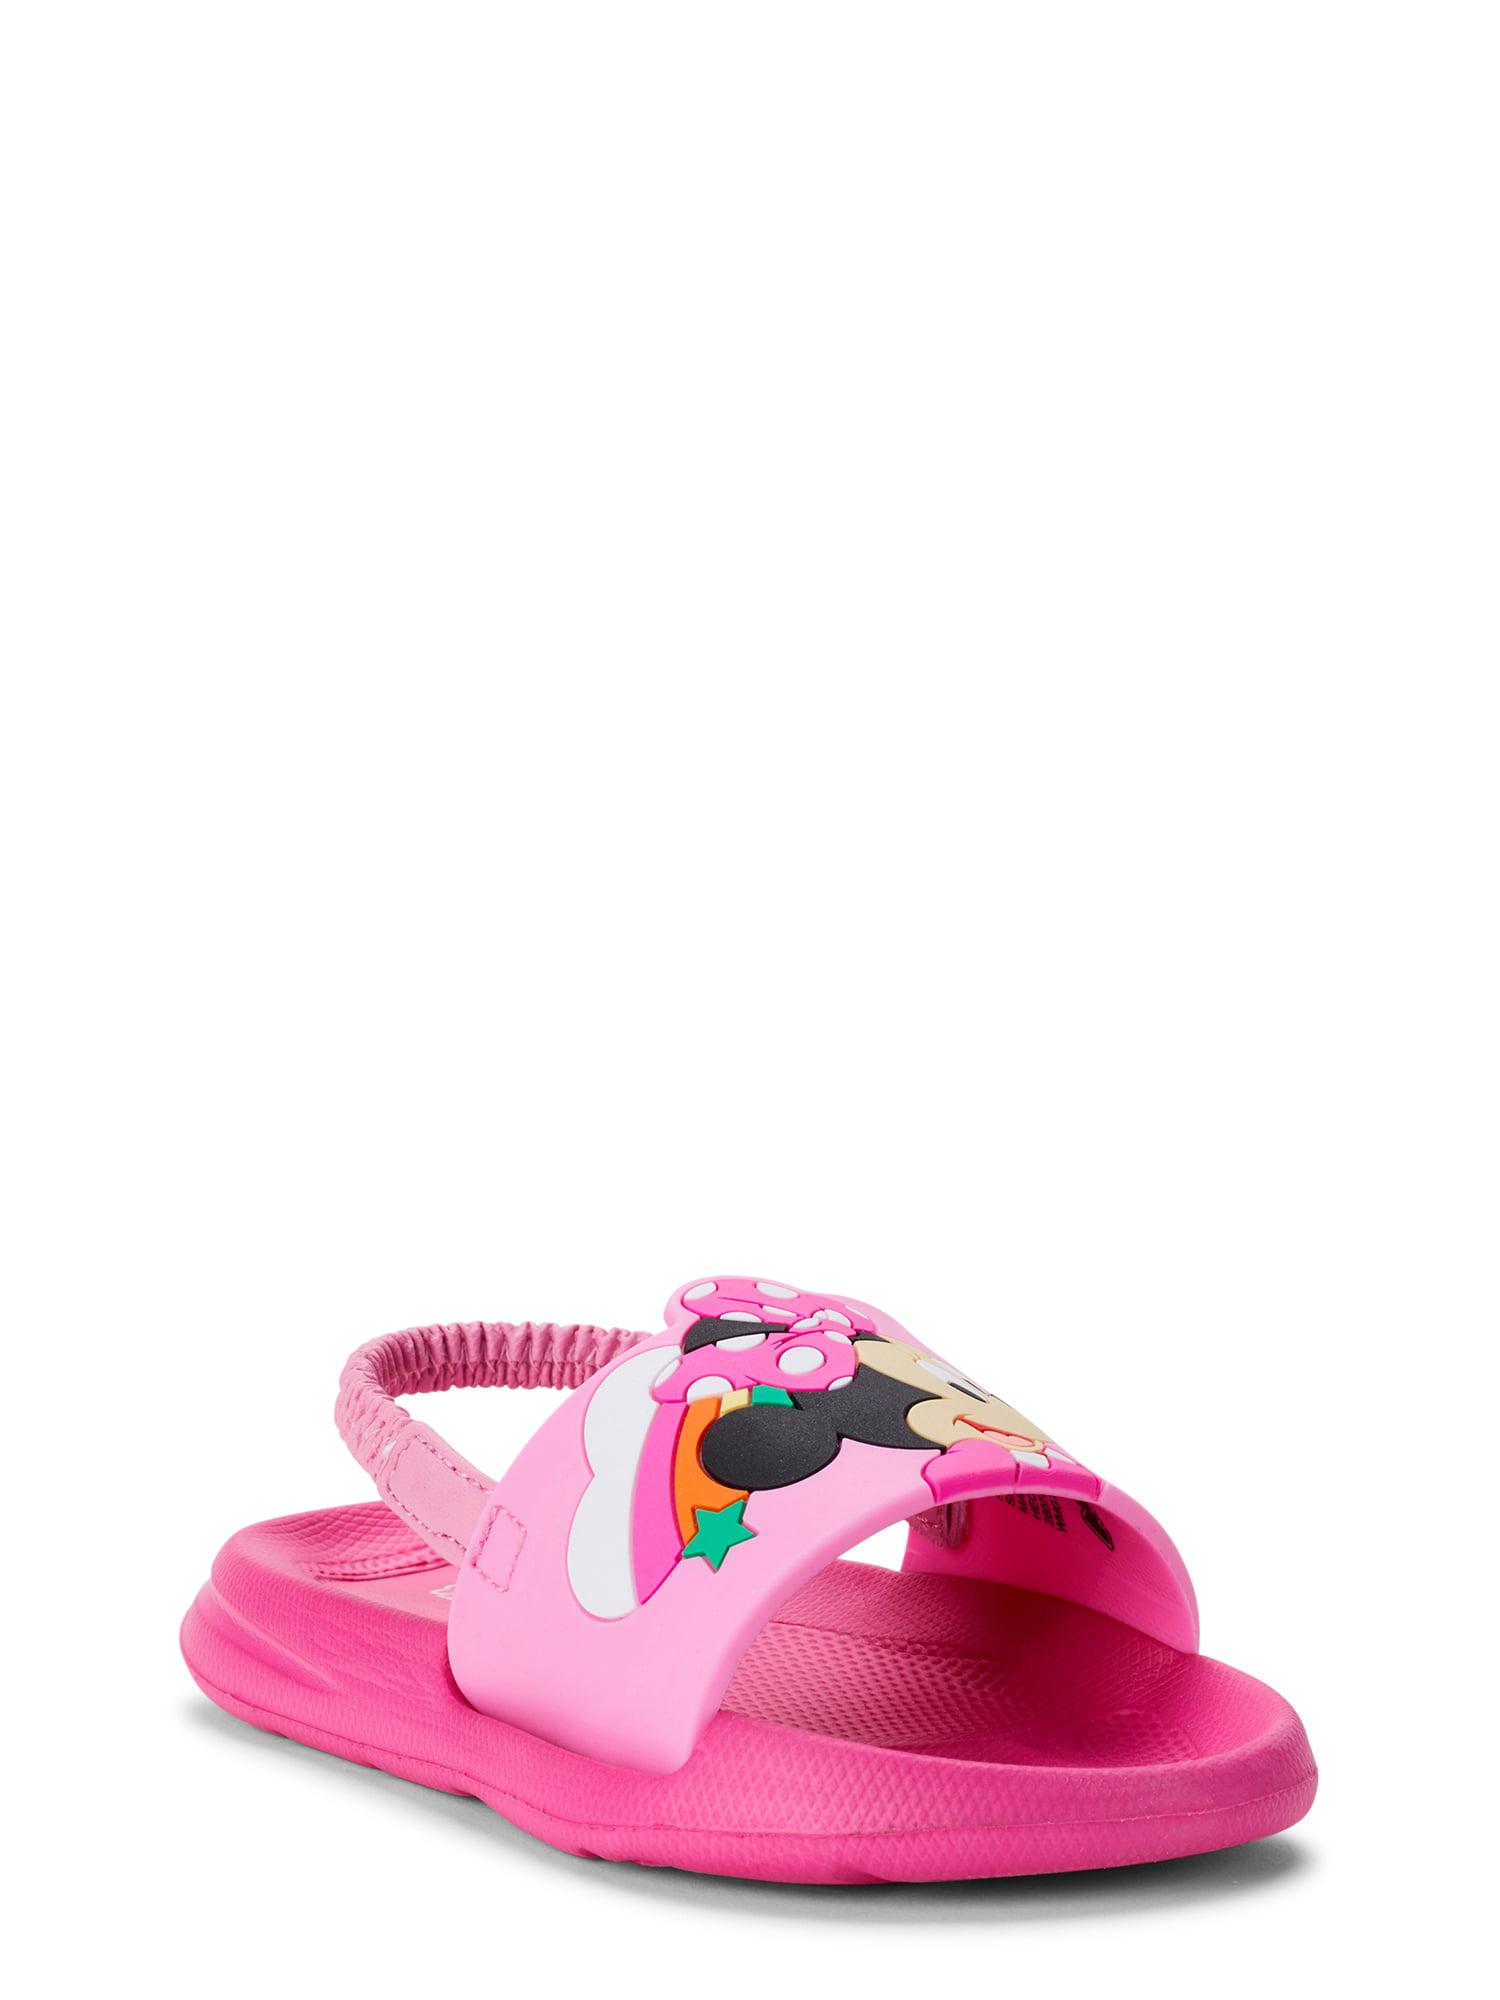 Disney Minnie Mouse Slide Sandal